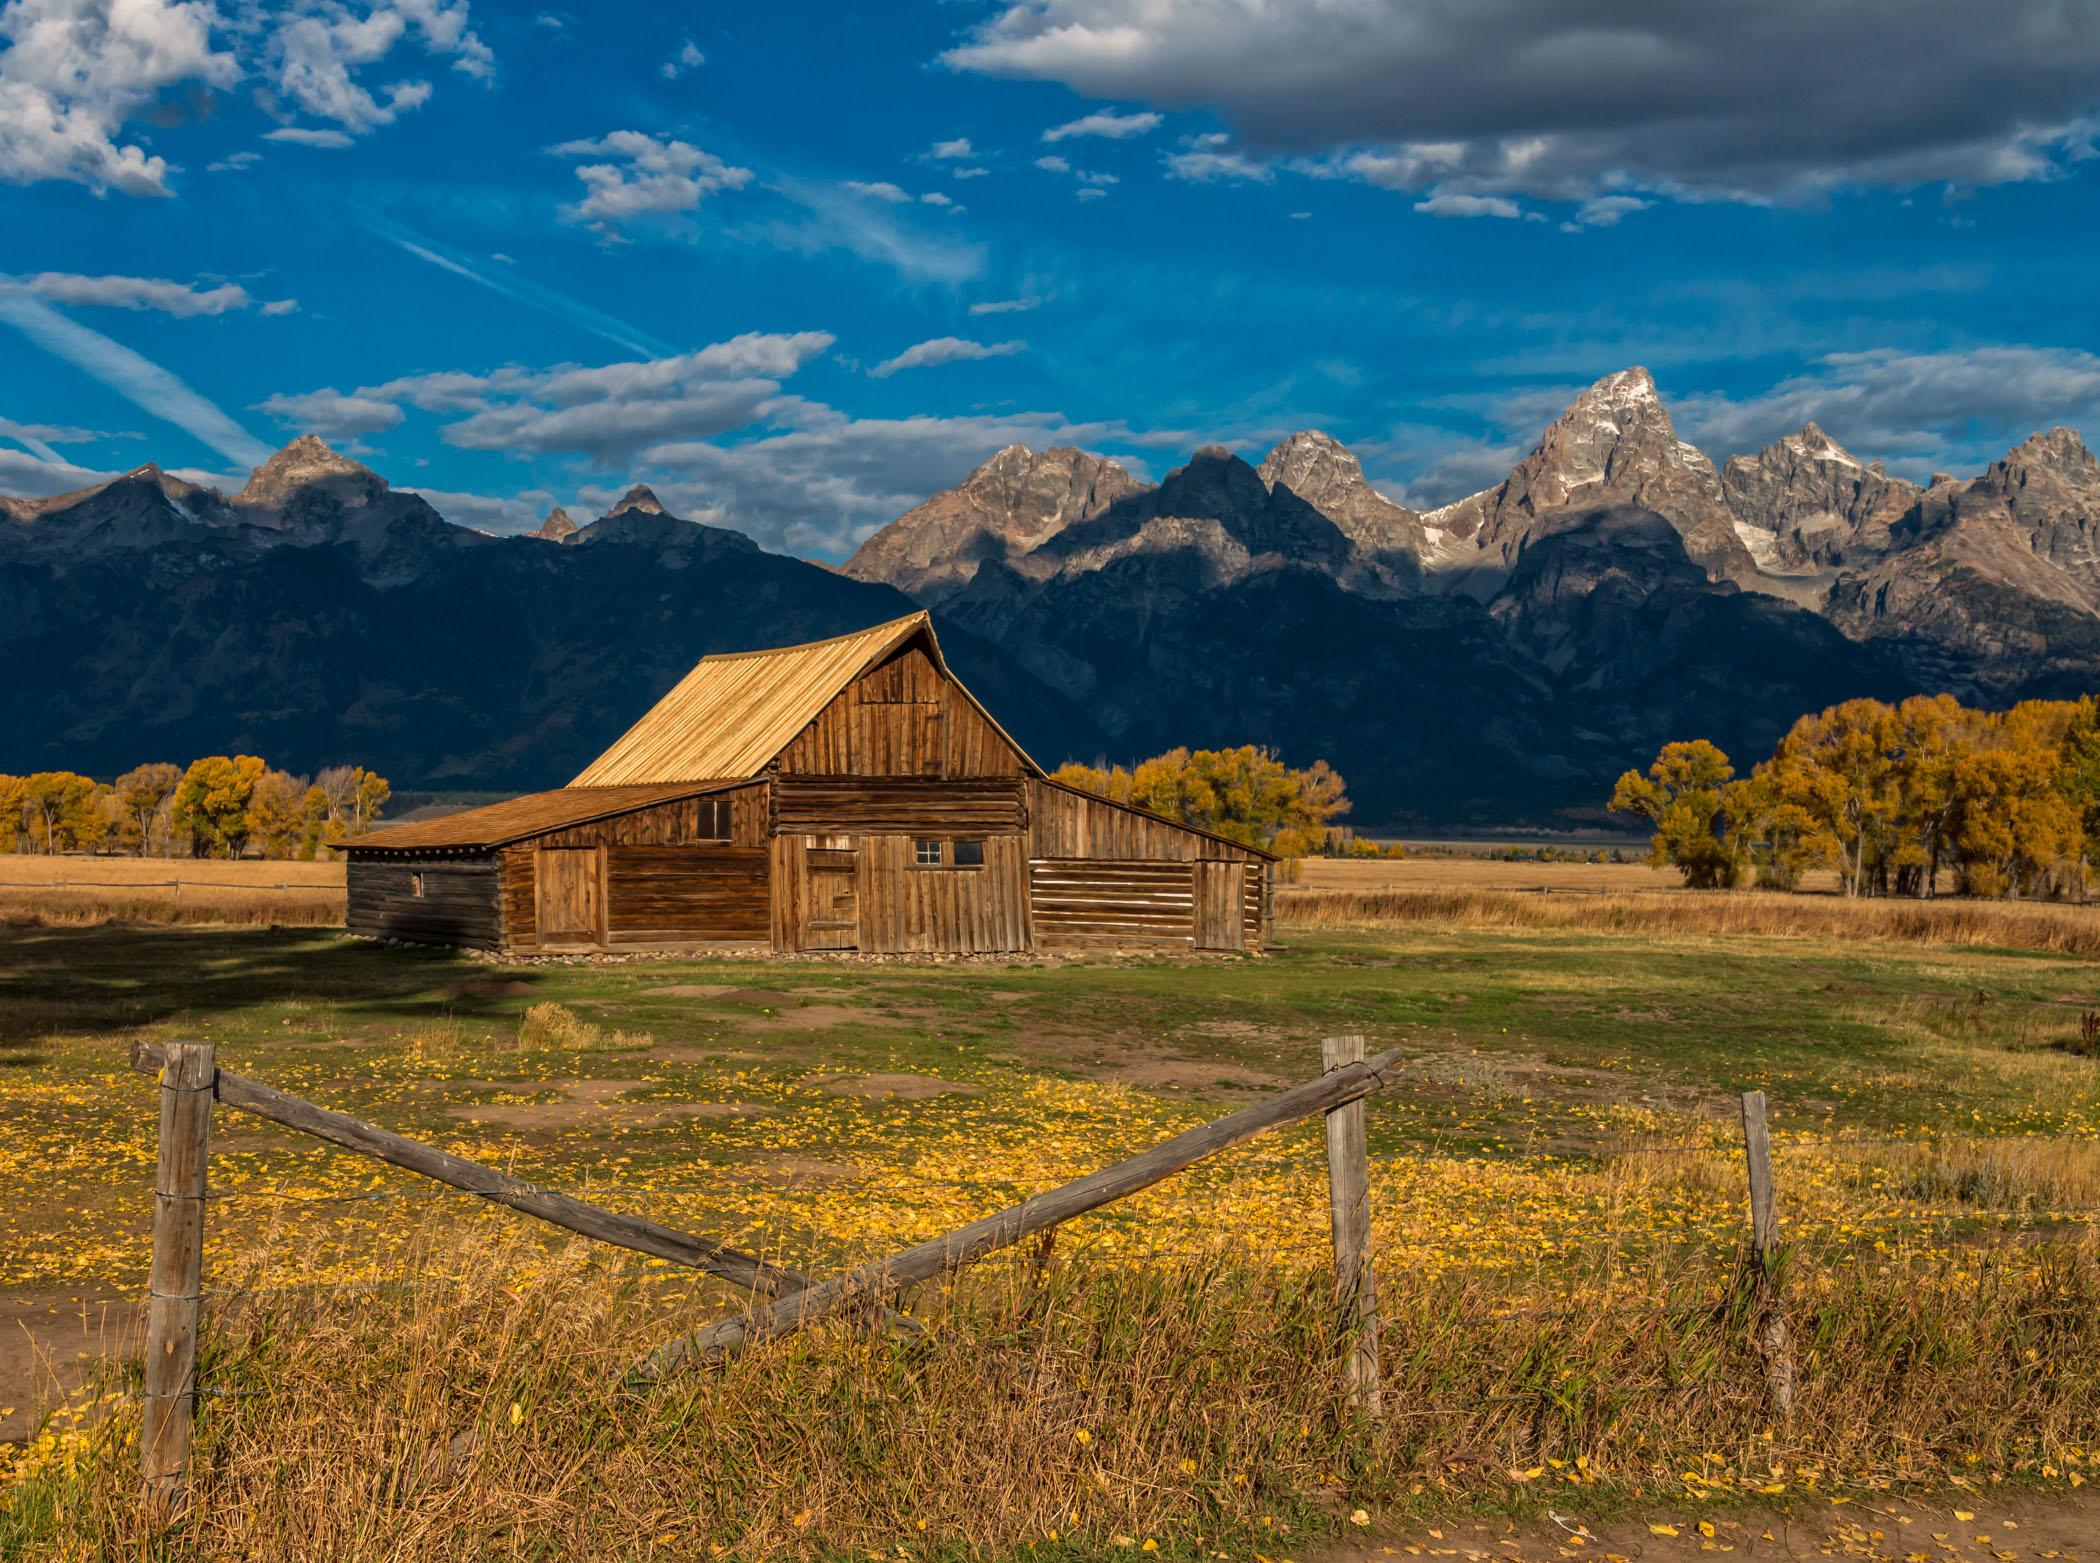 Mormon Barn in The Morning